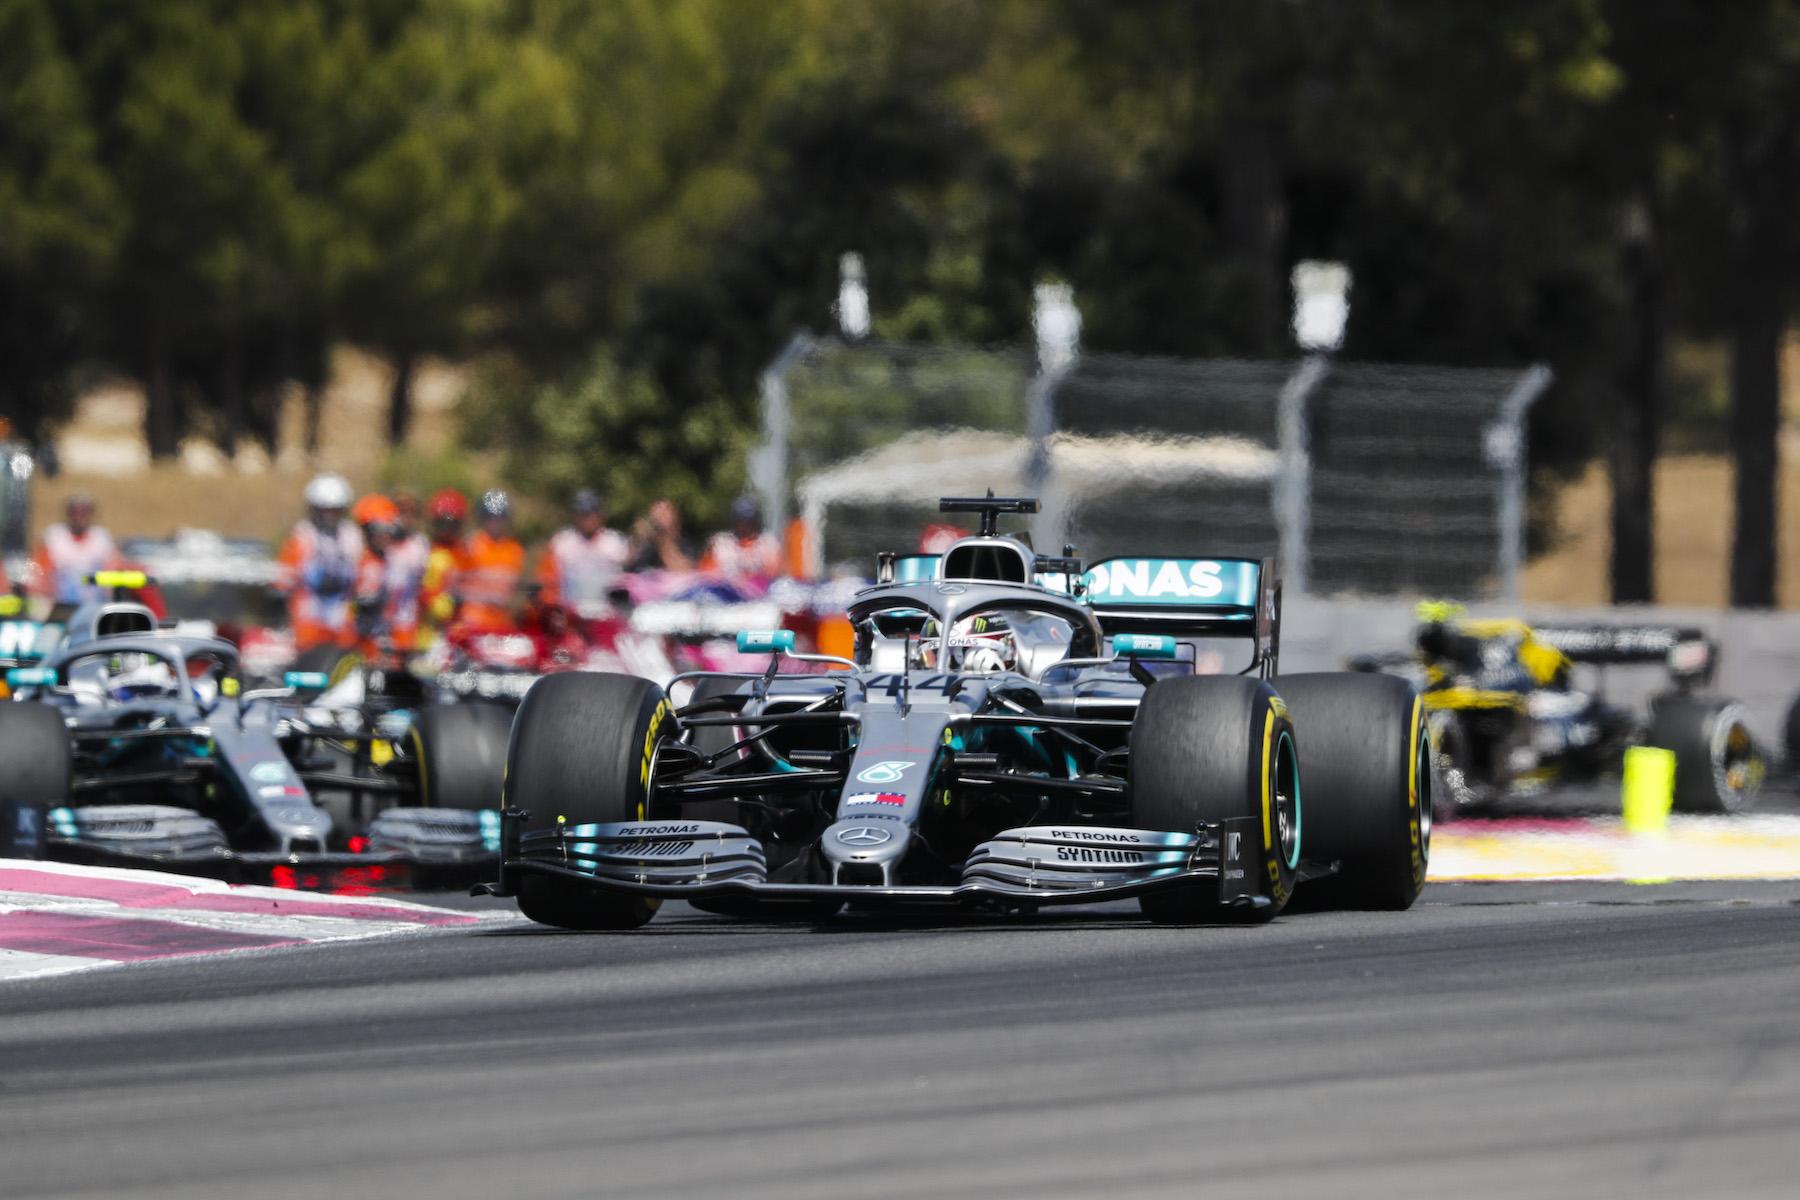 3 2019 French GP Sunday 35.jpg